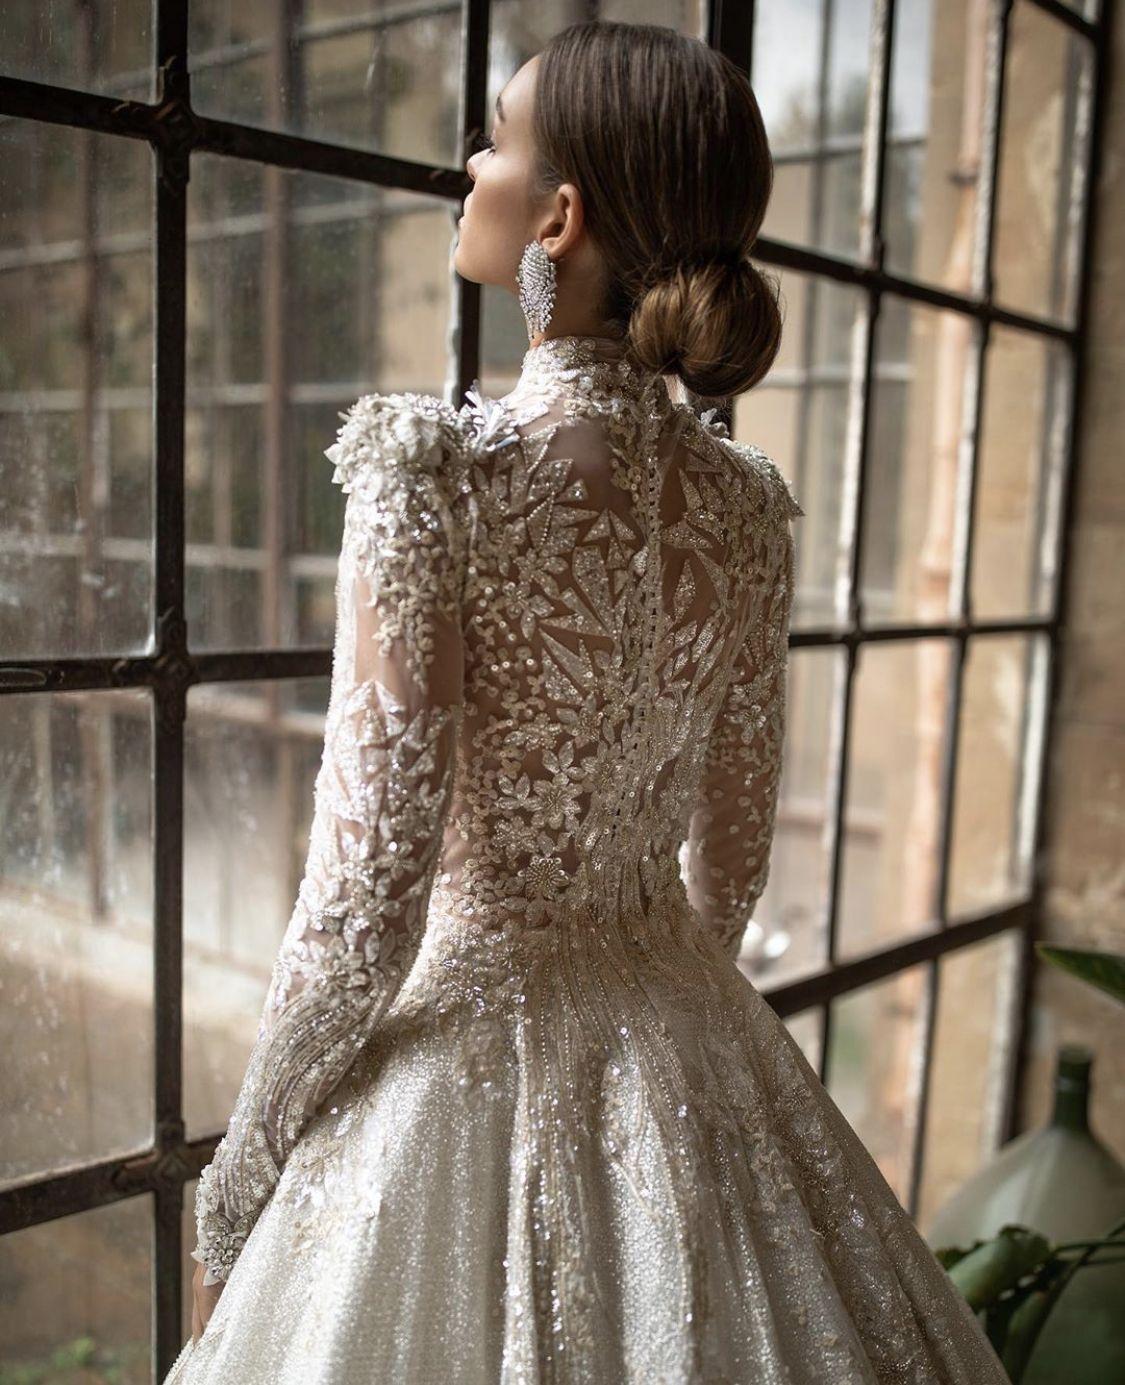 Viero Bridal Flagship Boutiques Bridal Dresses Wedding Dress Long Sleeve Wedding Dresses